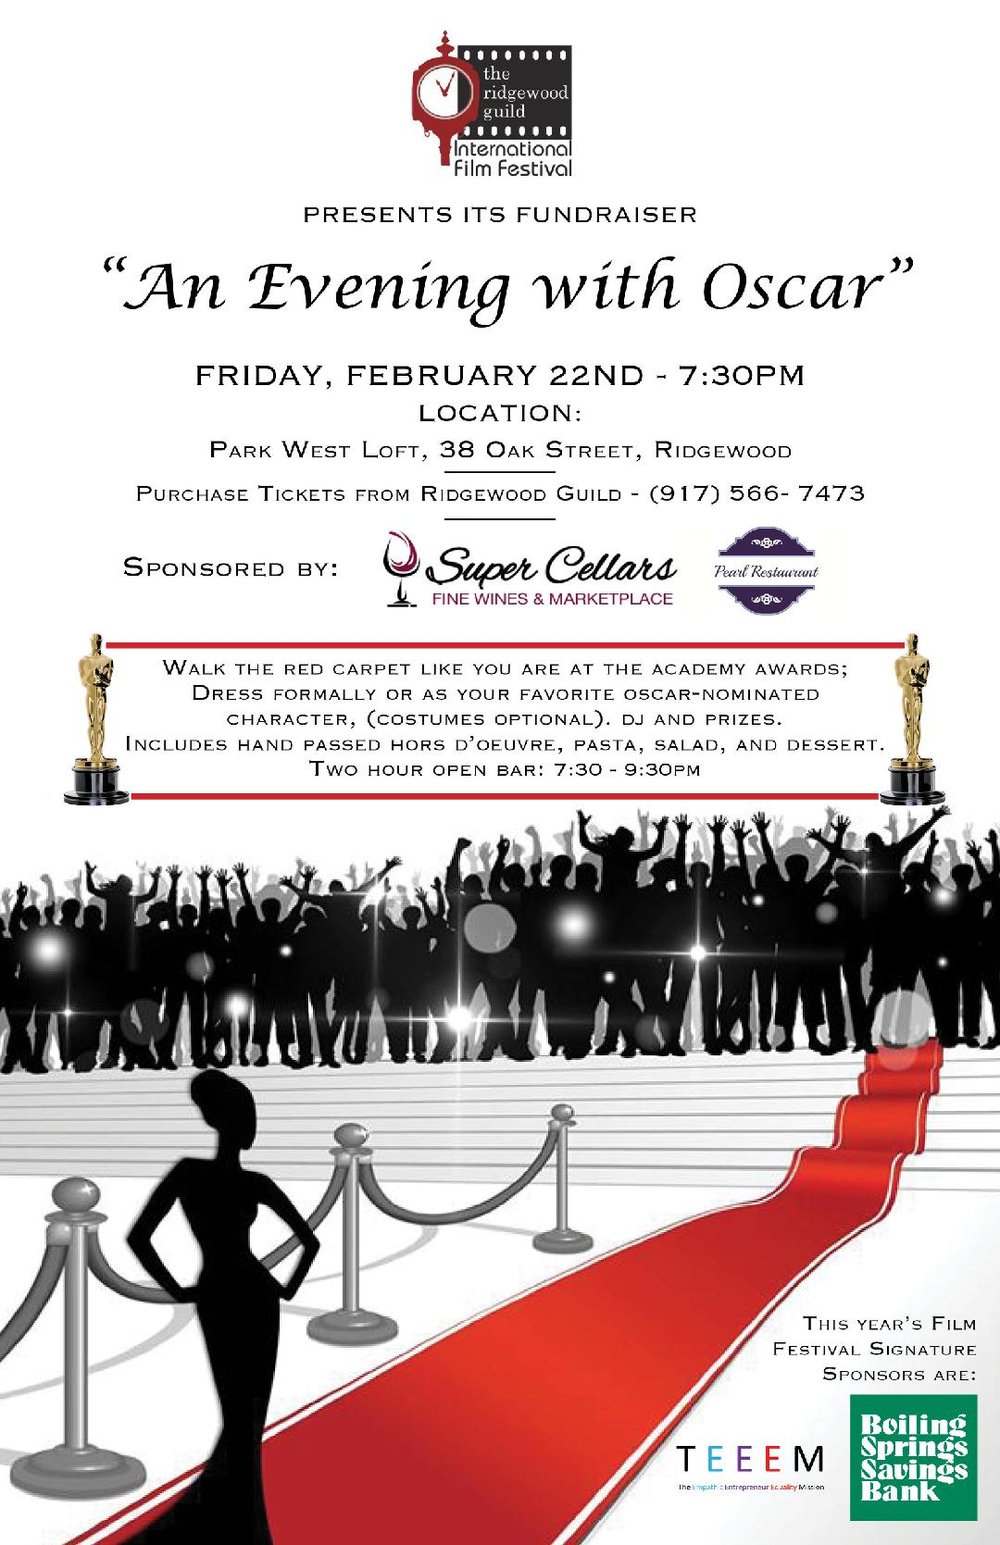 """An Evening with Oscar"" - Friday, February 22nd at 7:30 p.m.Park West Loft, 38 Oak Street, Ridgewood, NJ"